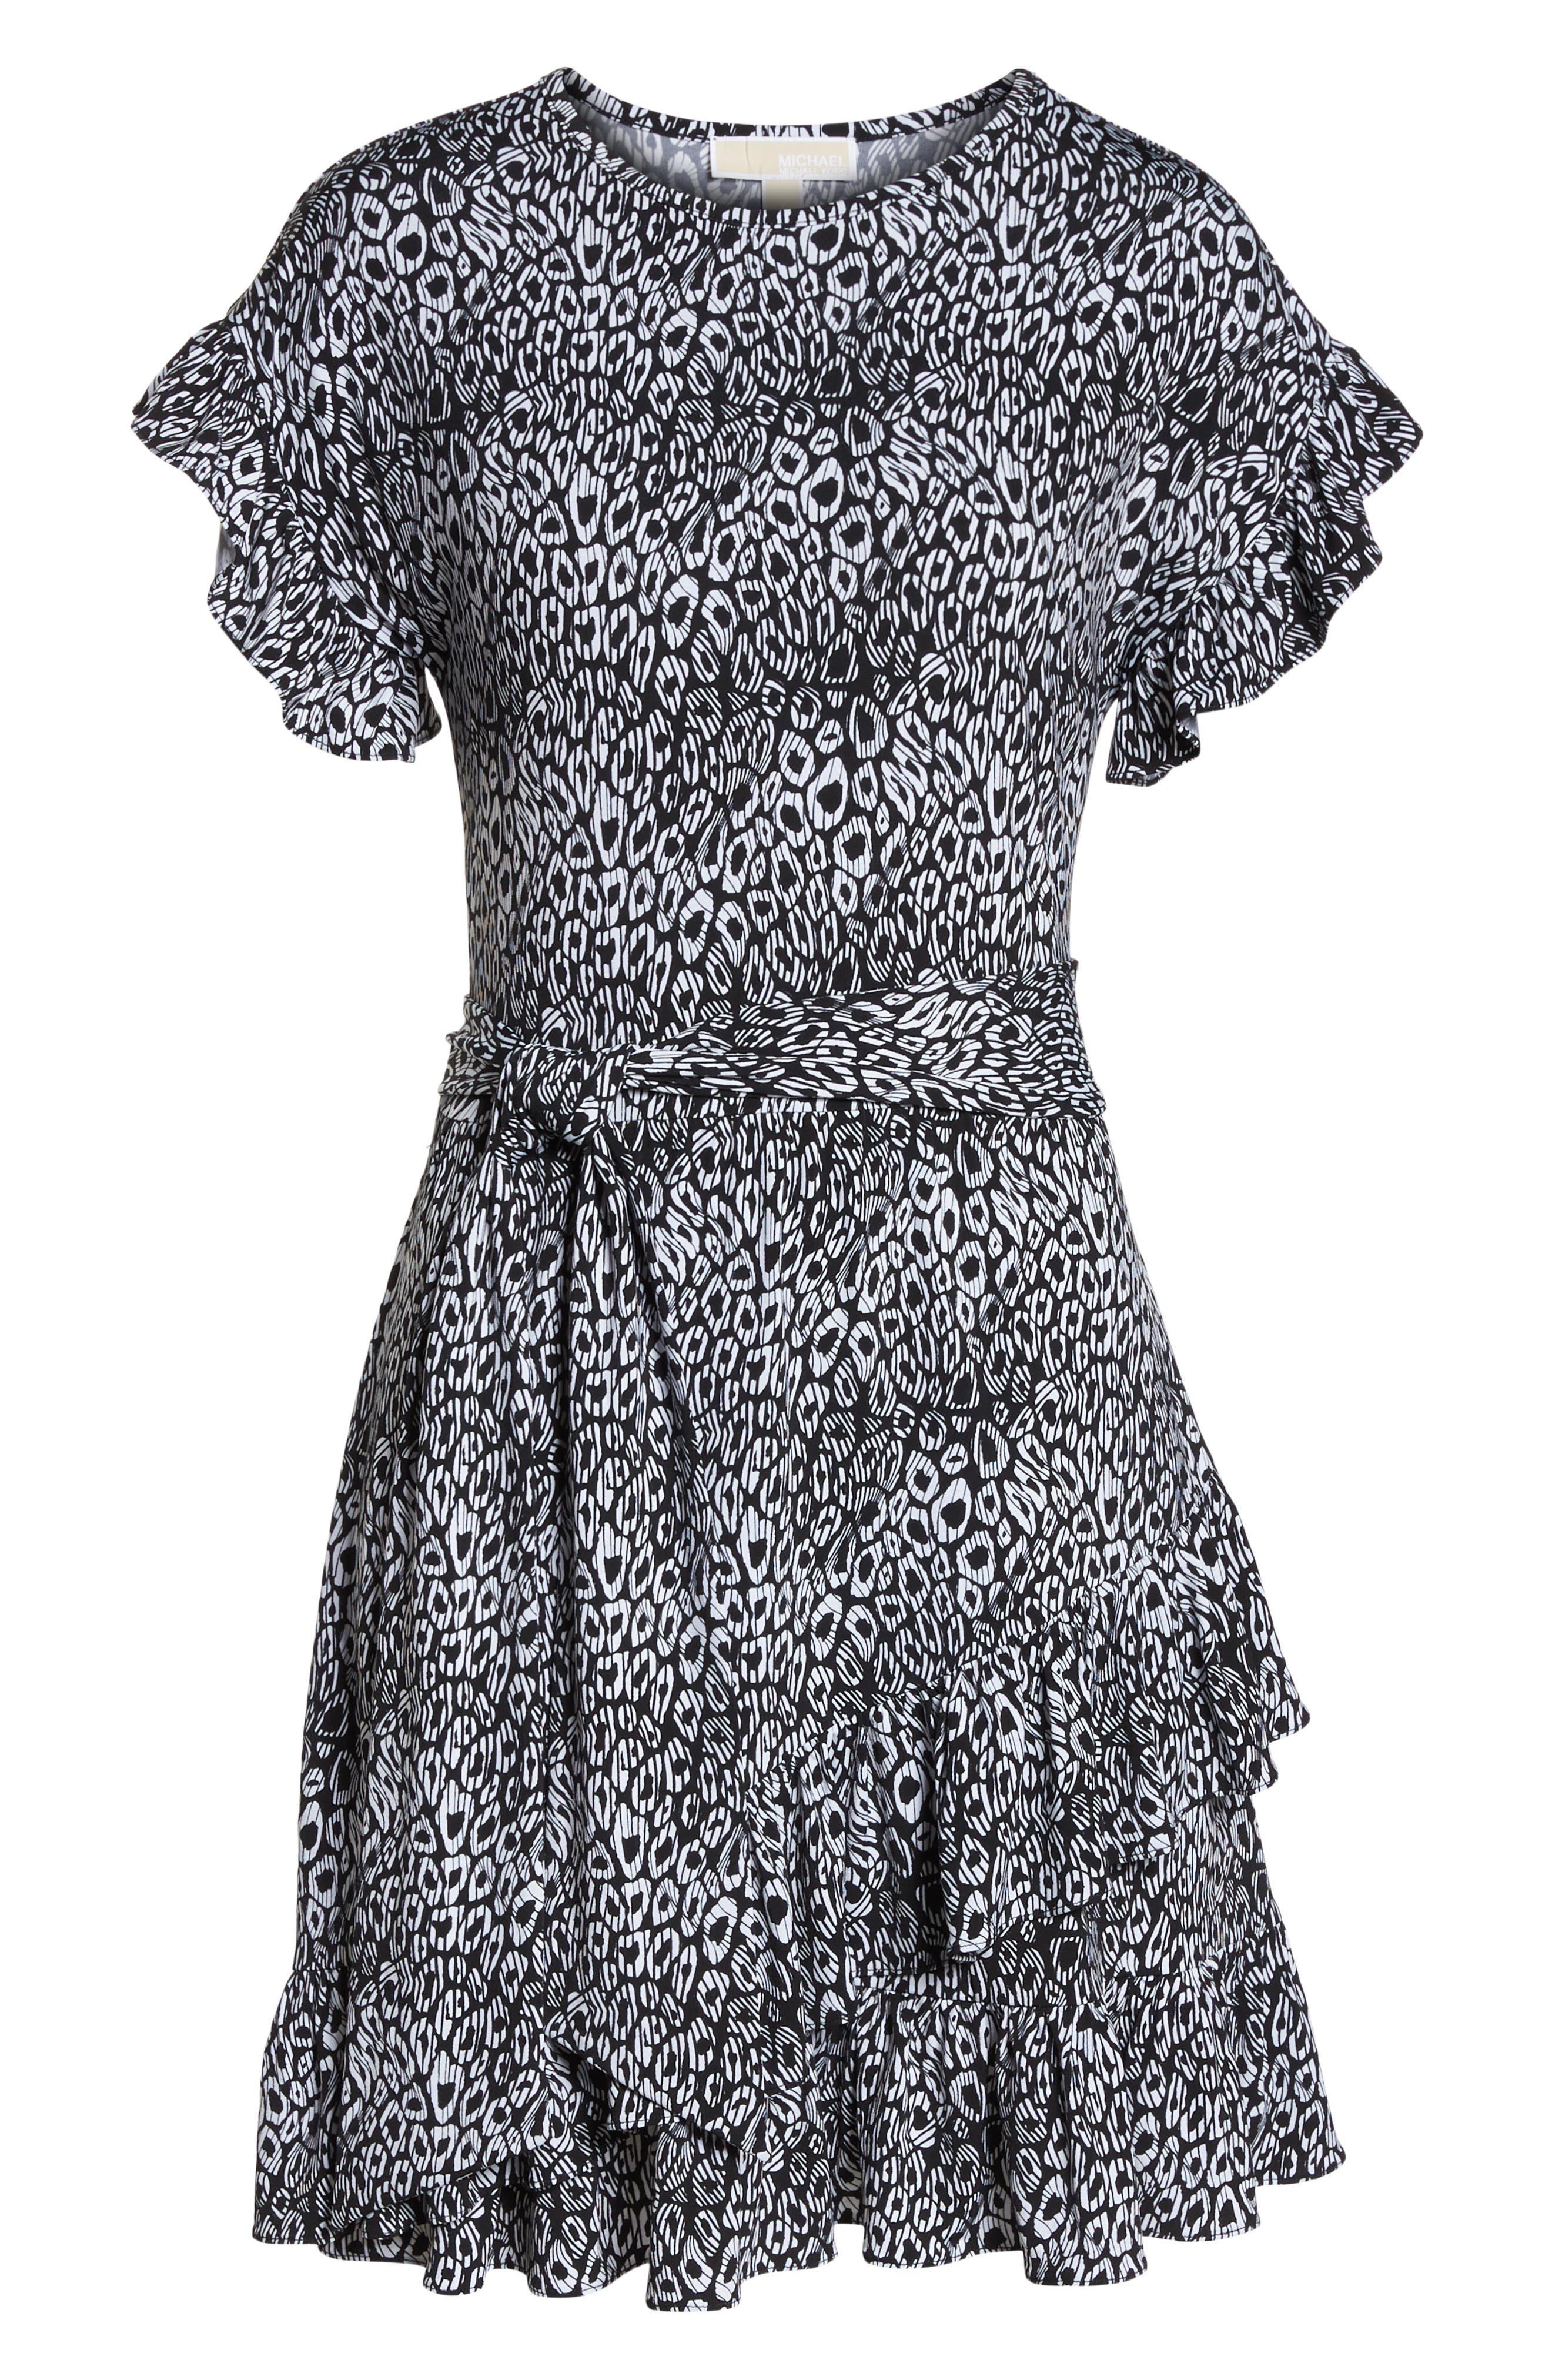 Wavy Leopard Print Ruffle Dress,                             Alternate thumbnail 7, color,